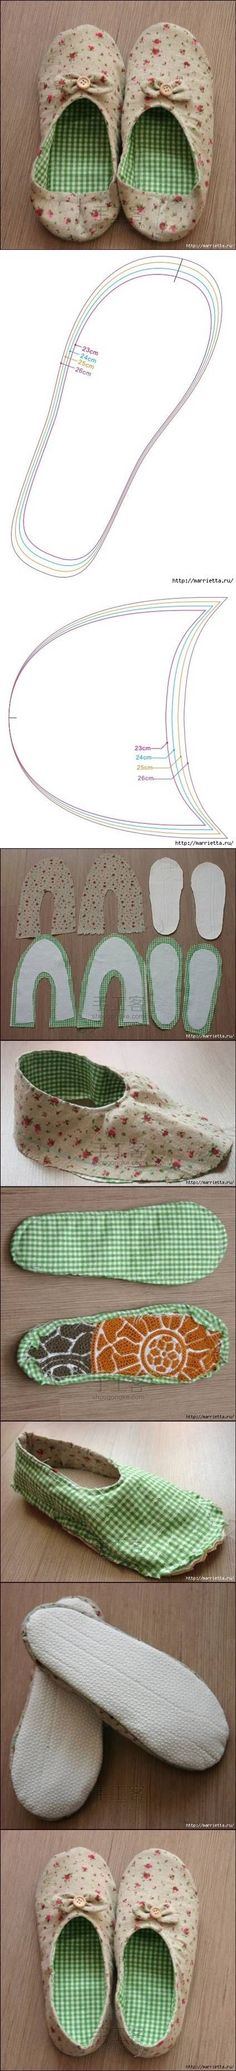 DIY Womens House Slippers: